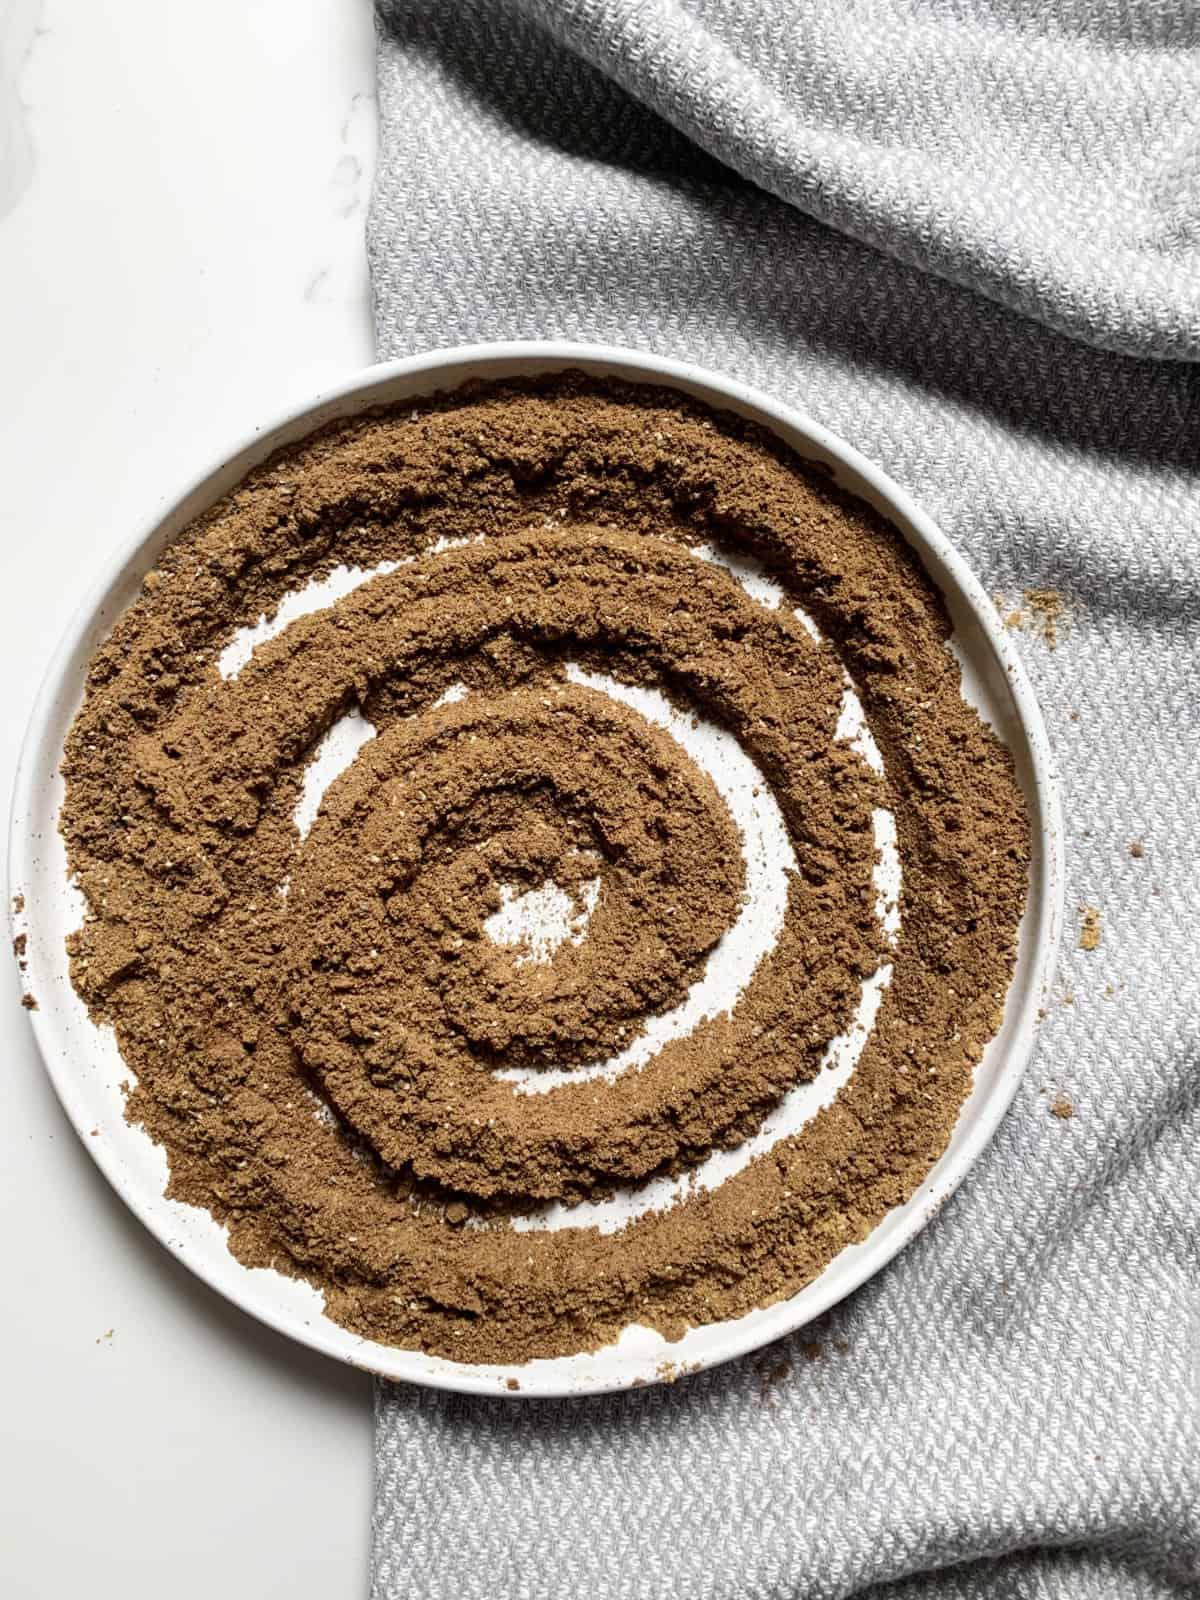 mixing lebanese 7 spice